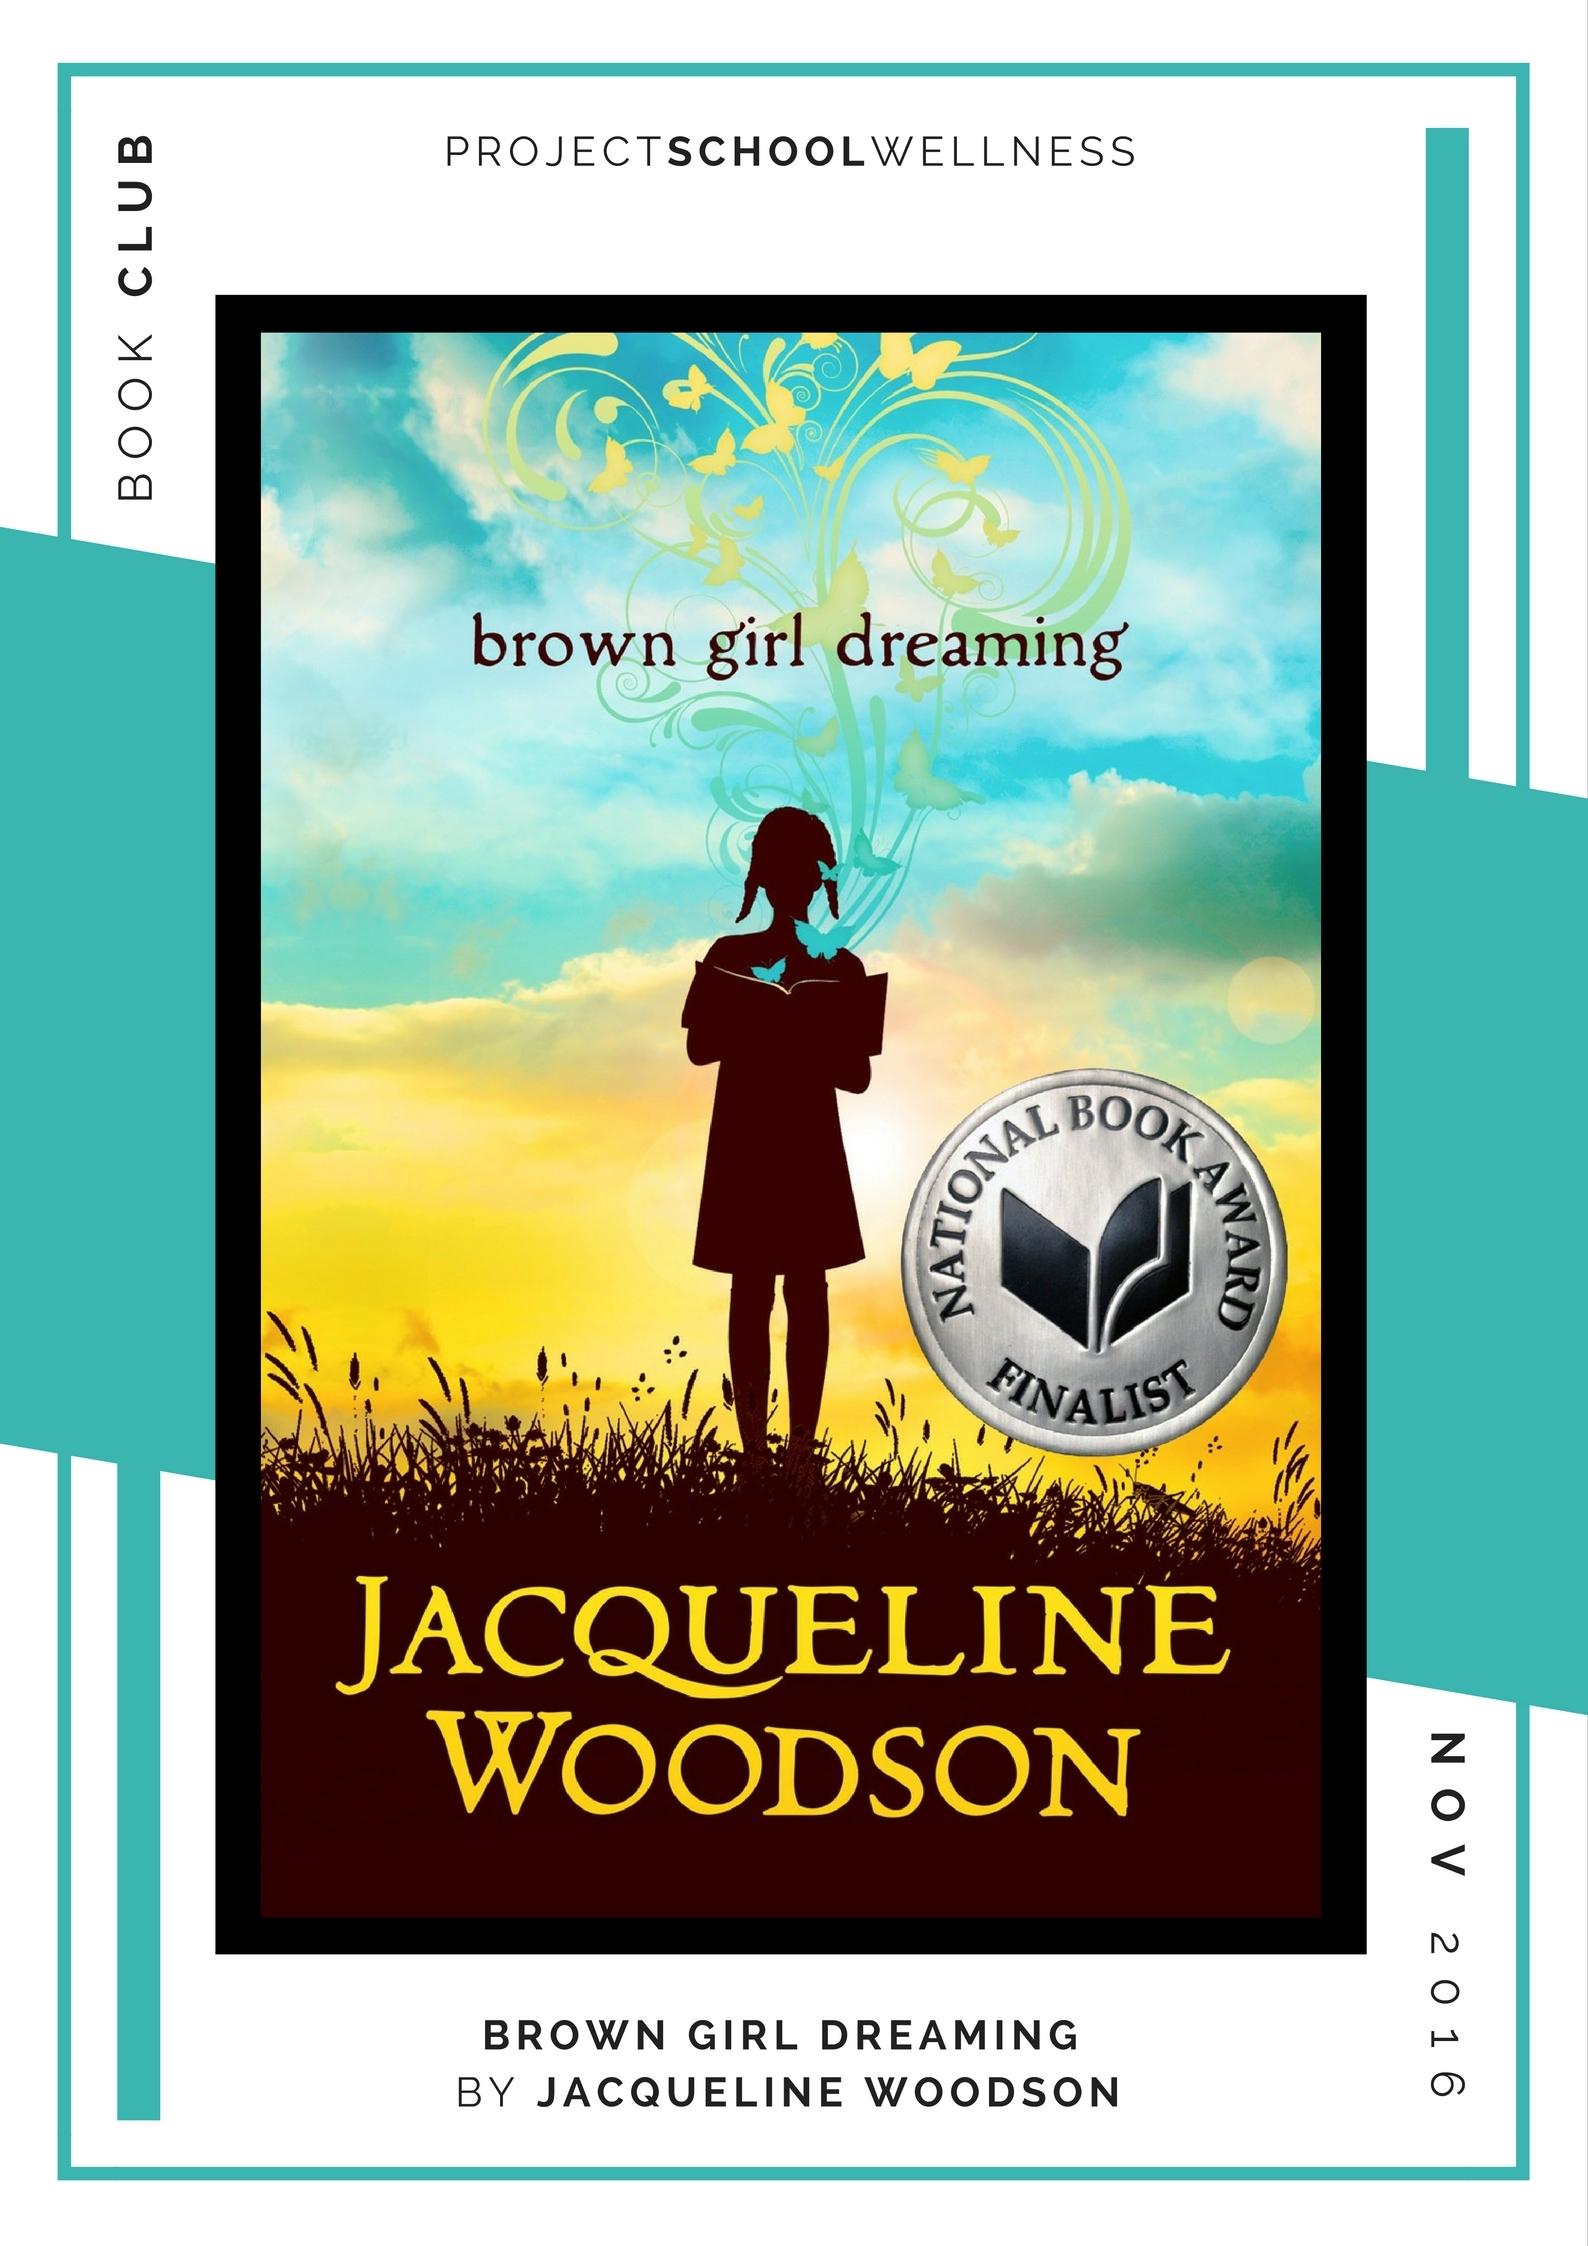 Jacqueline Woodson, Brown Girl Dreaming - Project School Wellness' Teacher Book Club, must read books for every teacher!